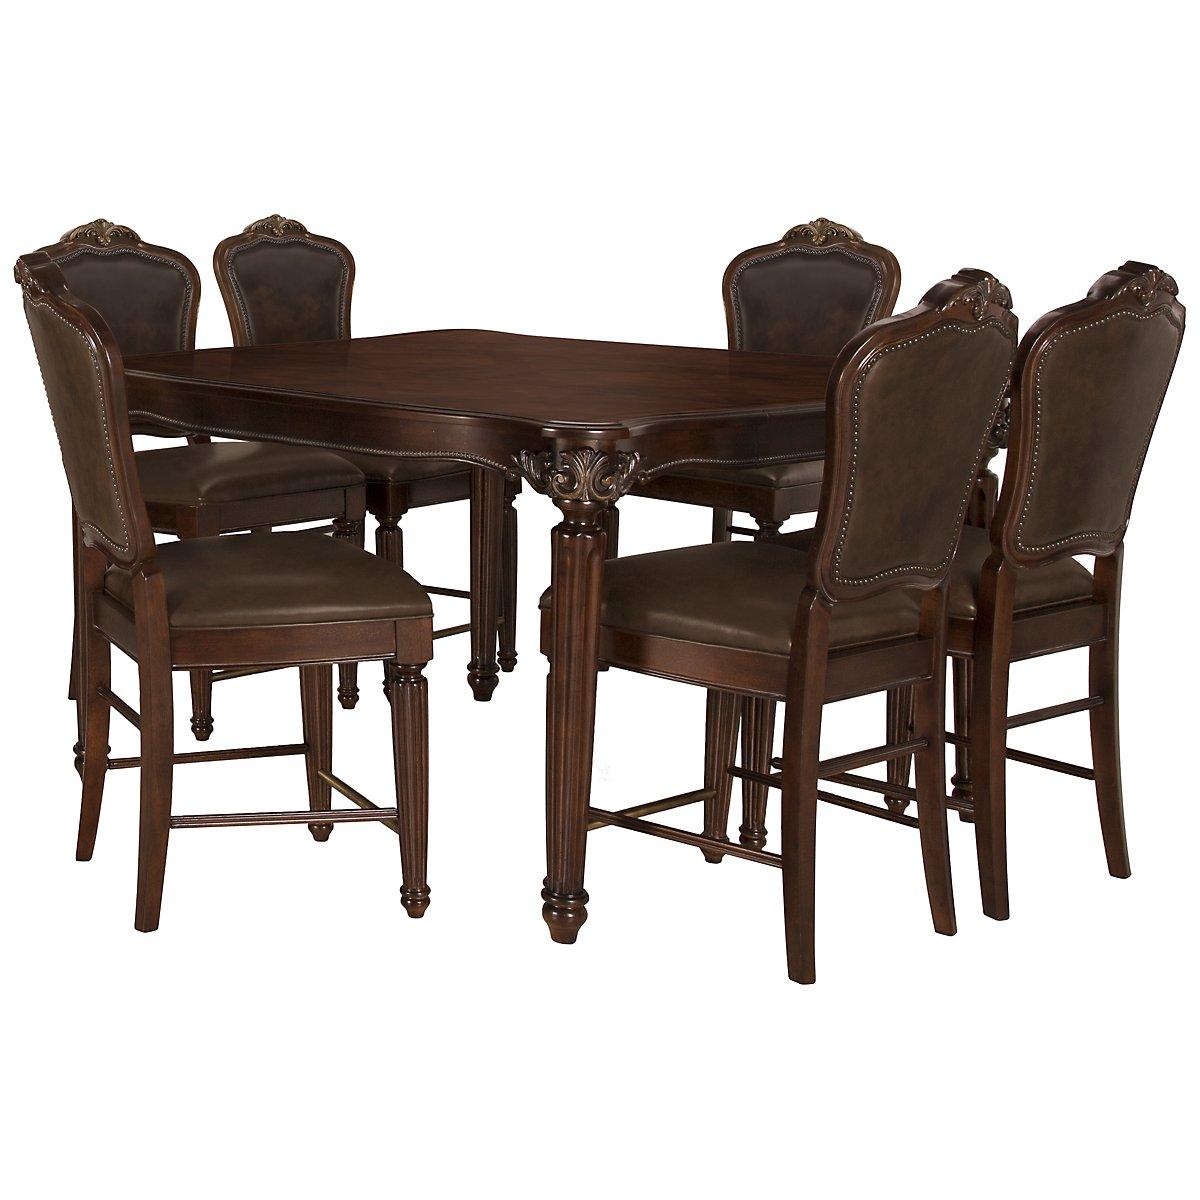 Regal Dark Tone High Table & 4 Leather Barstools